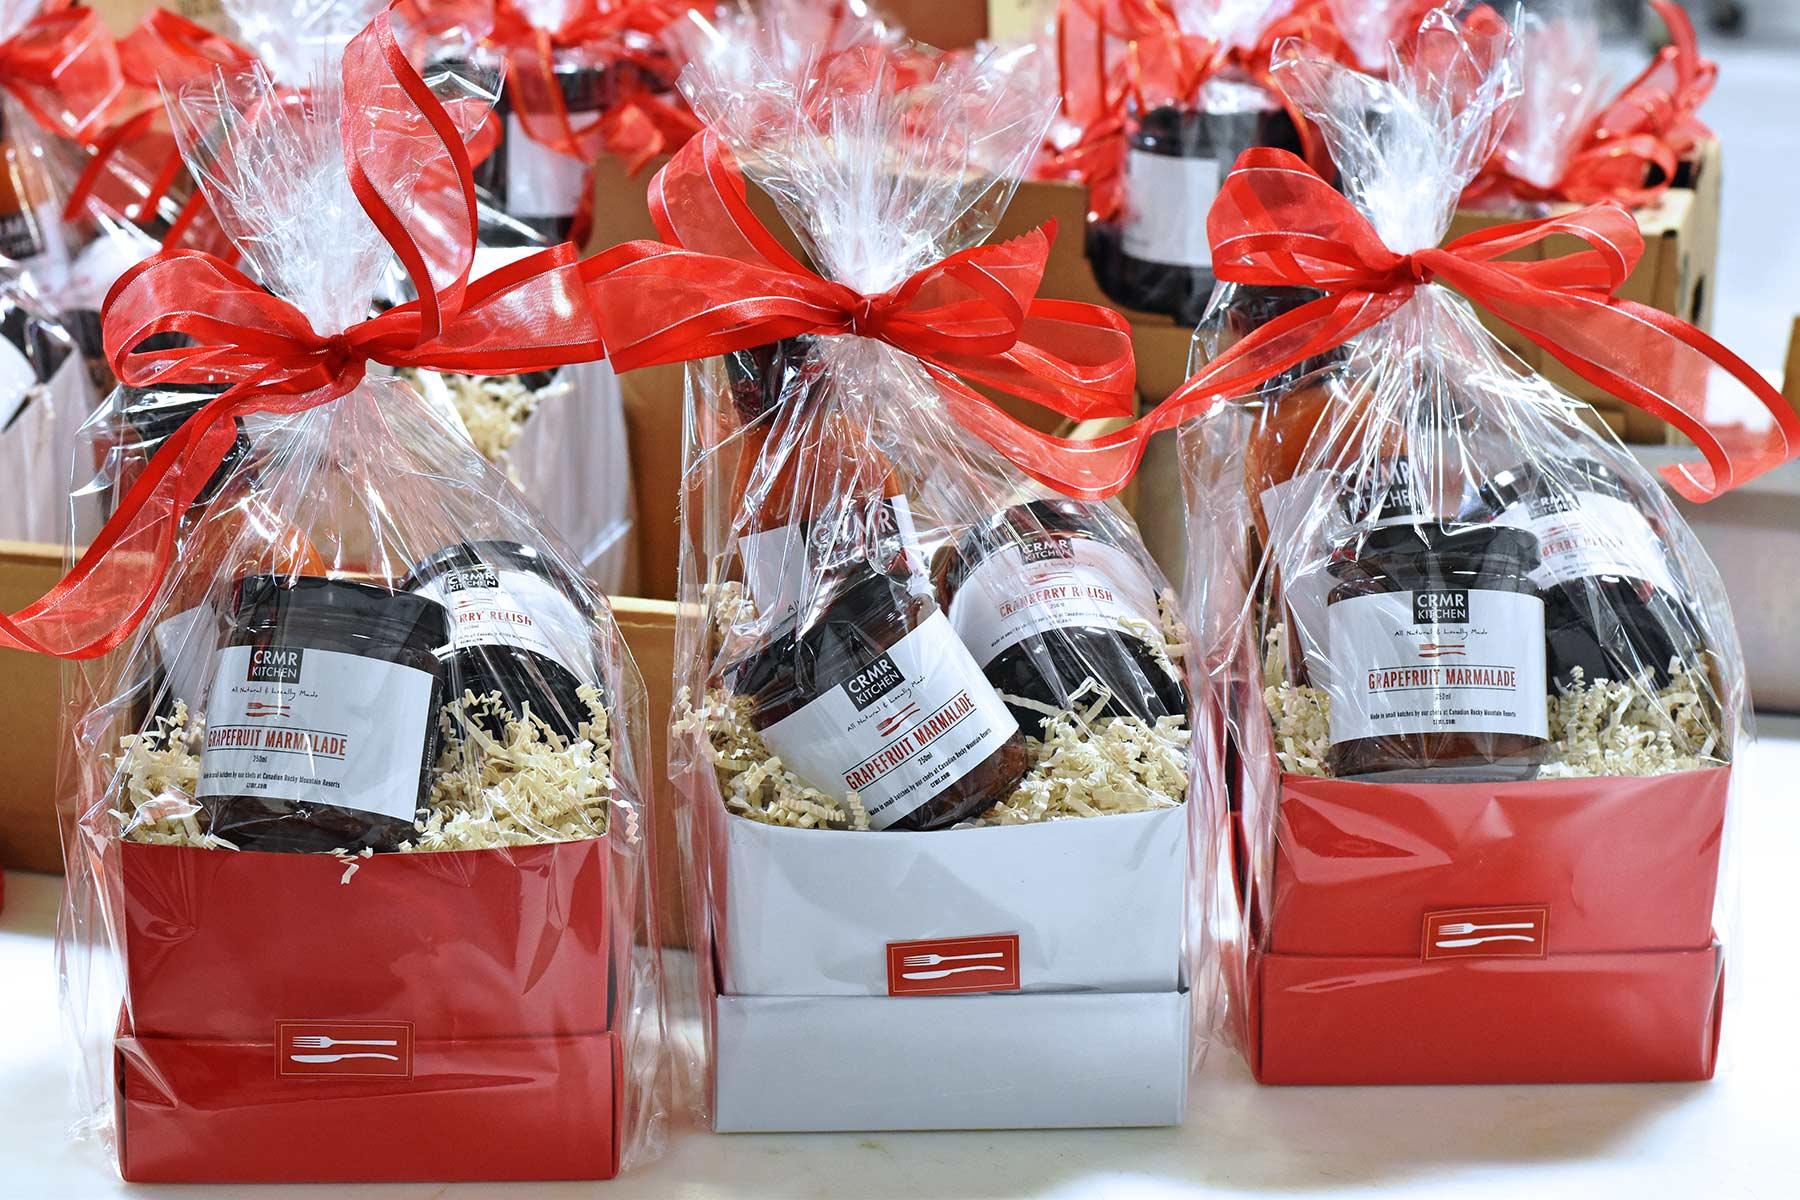 Urban-Butcher-gift-baskets-2017